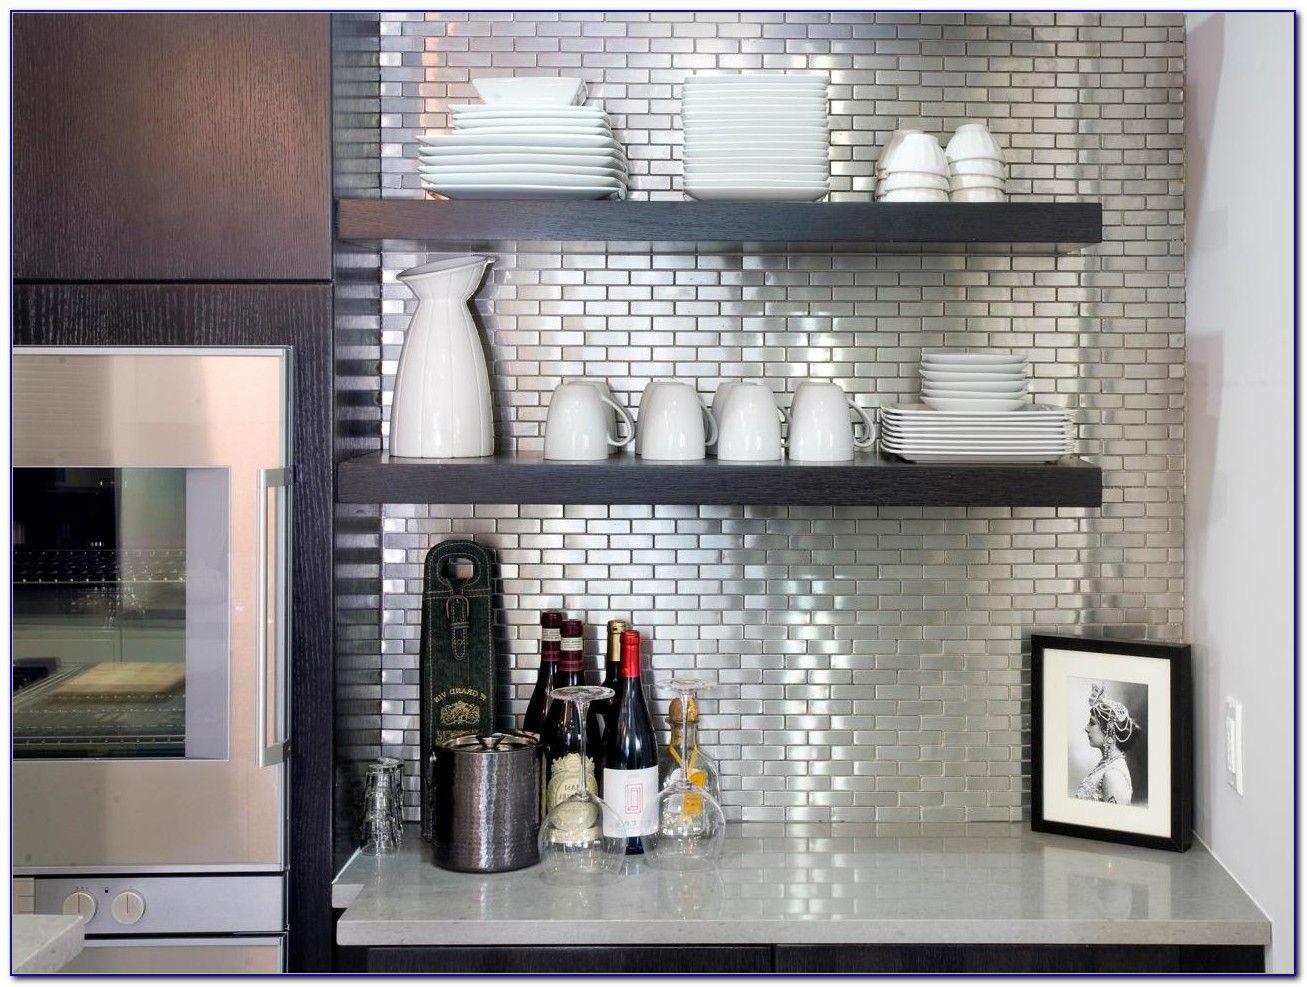 Stainless Steel Backsplash Tiles Menards Trendy Kitchen Backsplash Stainless Backsplash Stainless Steel Backsplash